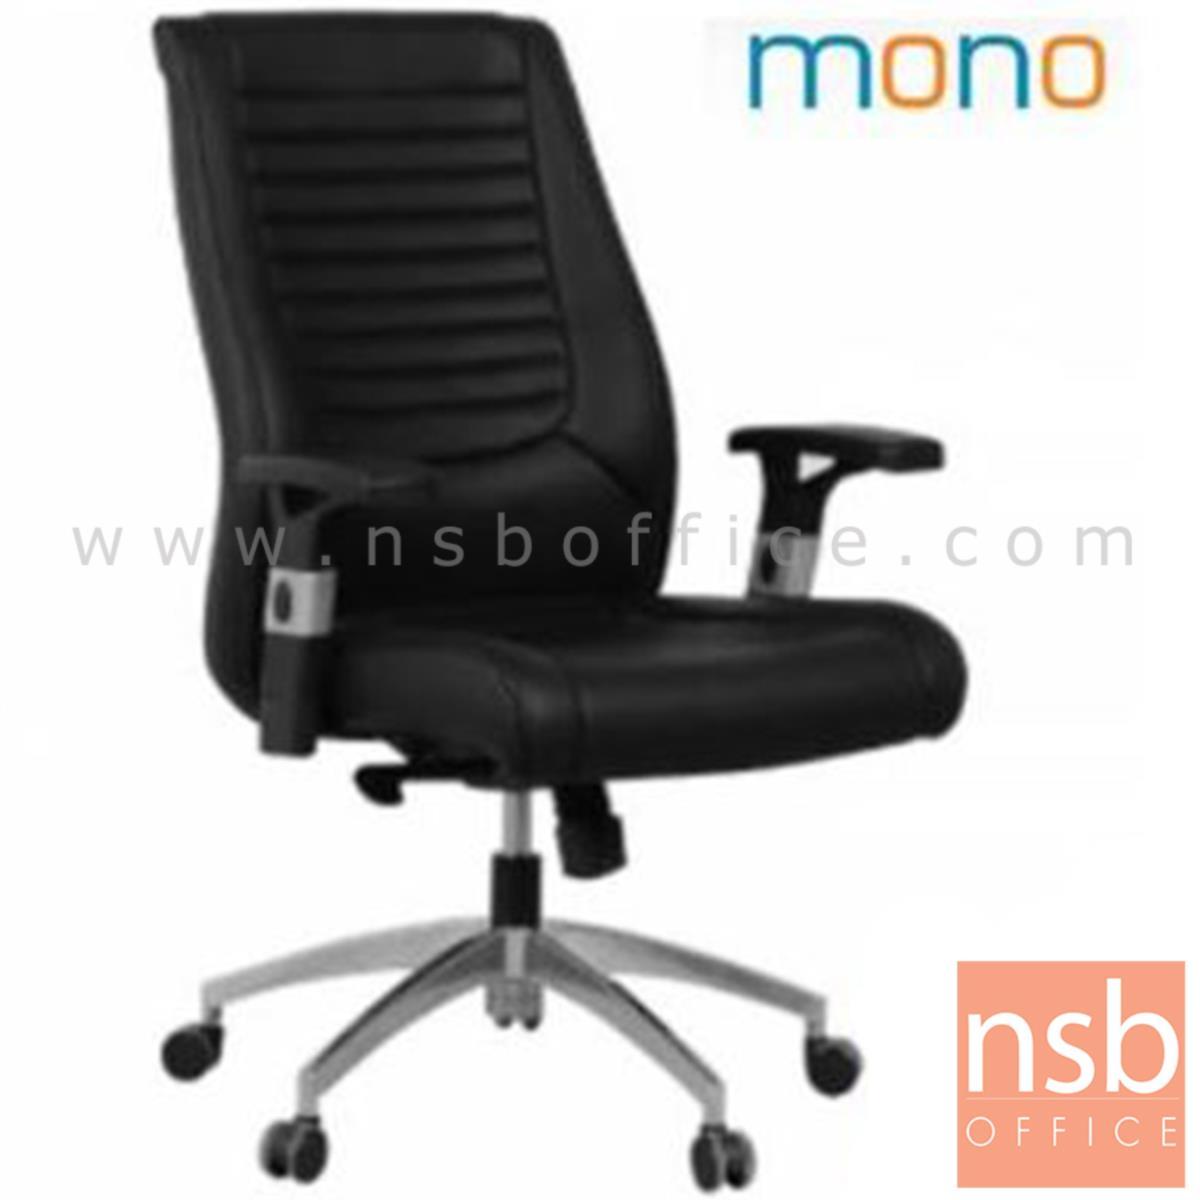 B26A108:เก้าอี้สำนักงาน รุ่น MN-SM104  โช๊คแก๊ส มีก้อนโยก ขาเหล็กชุบโครเมี่ยม